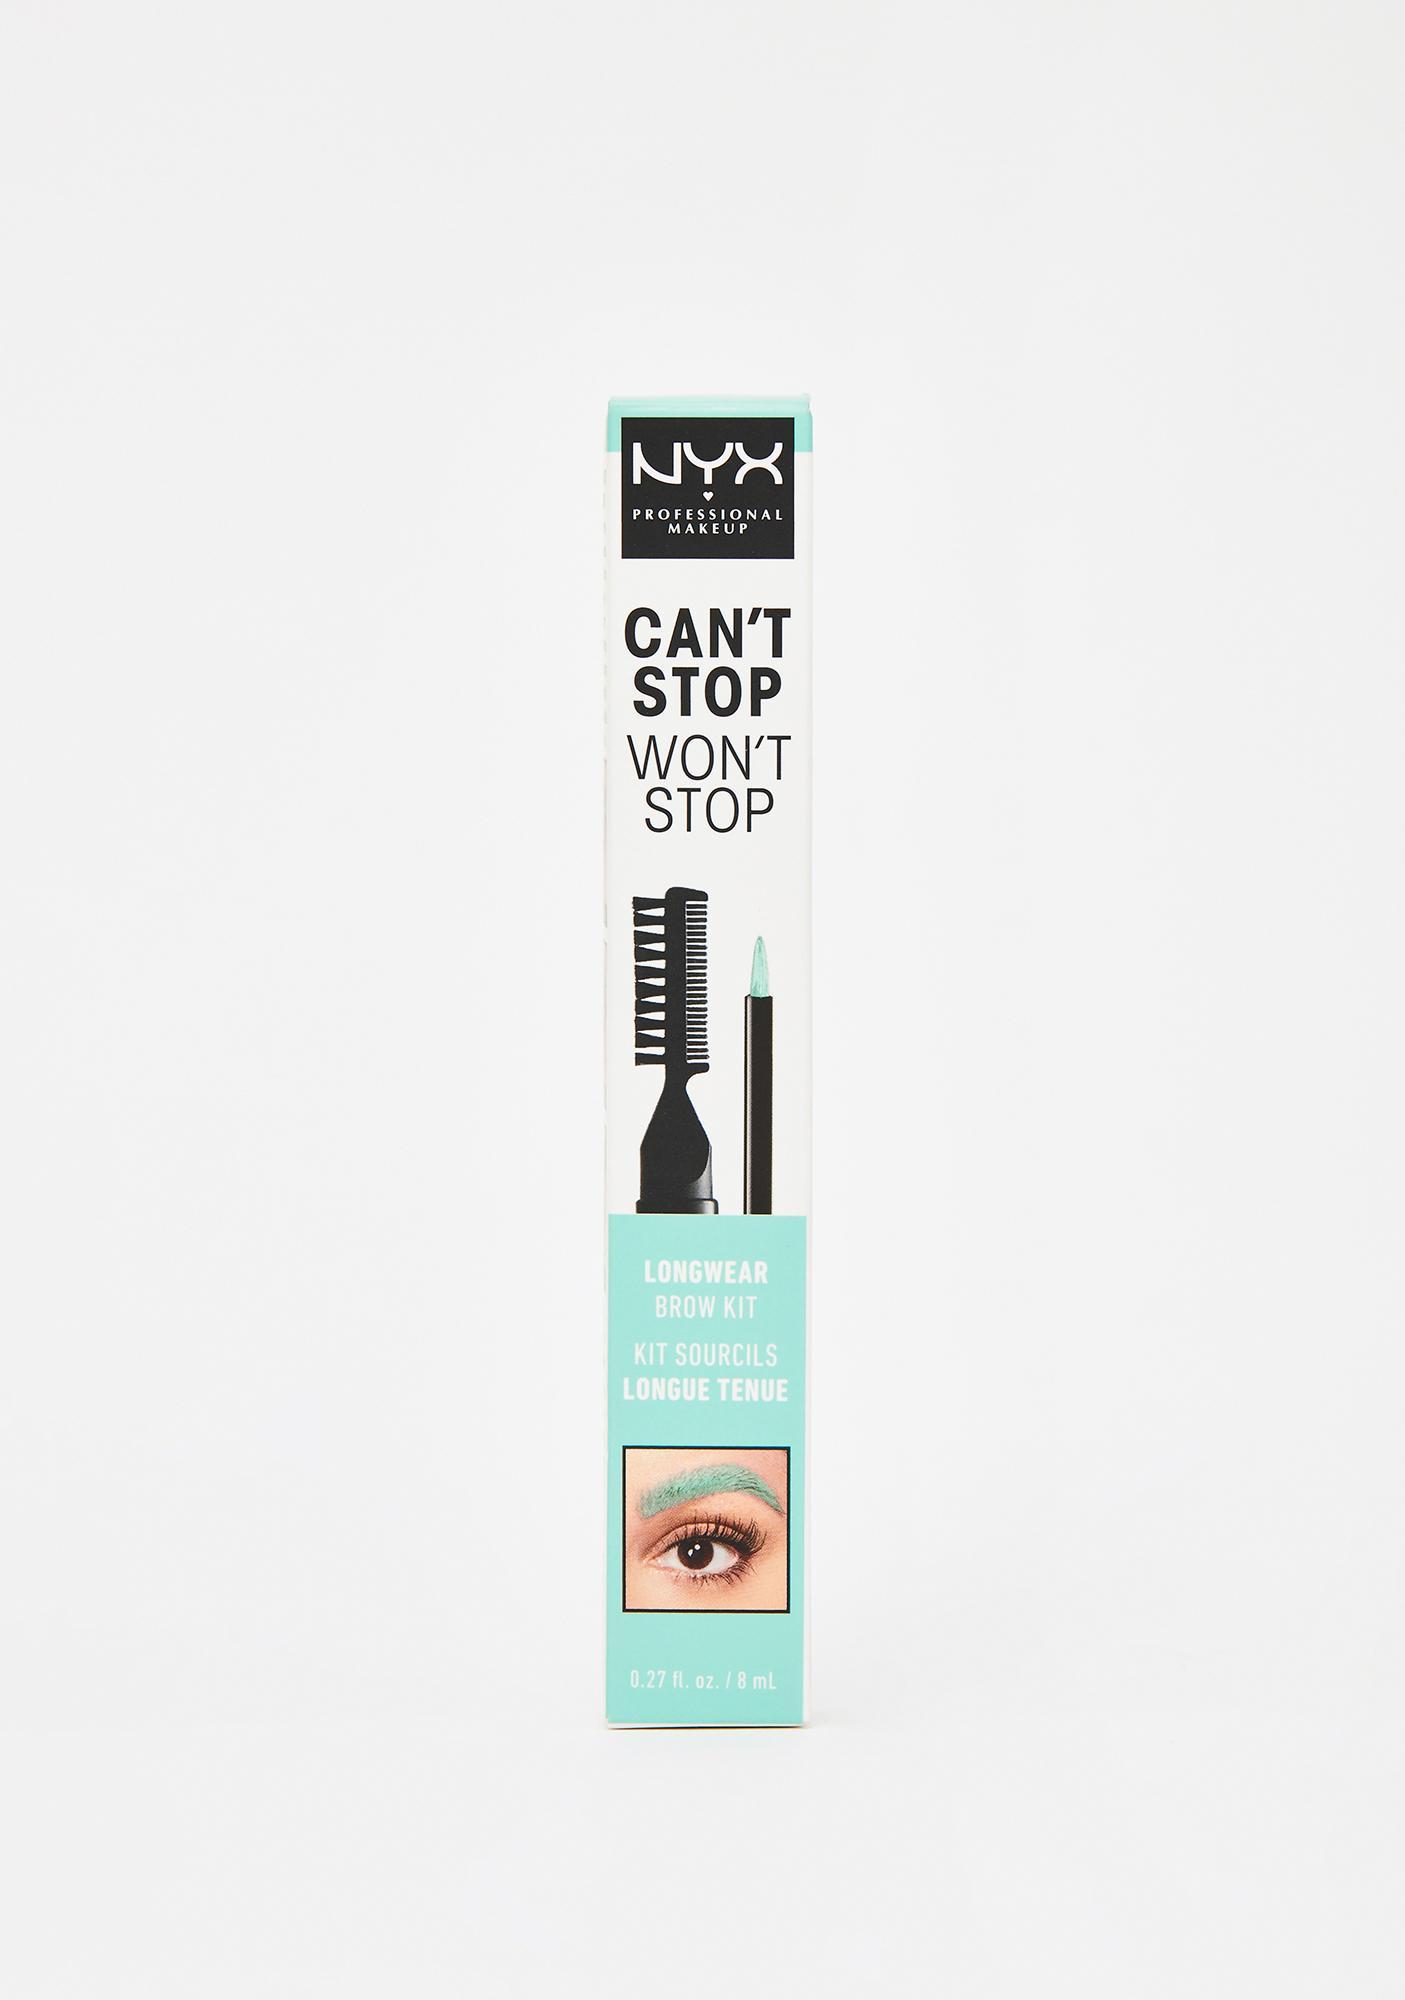 NYX Professional Makeup Mint Can't Stop Won't Stop Longwear Brow Kit